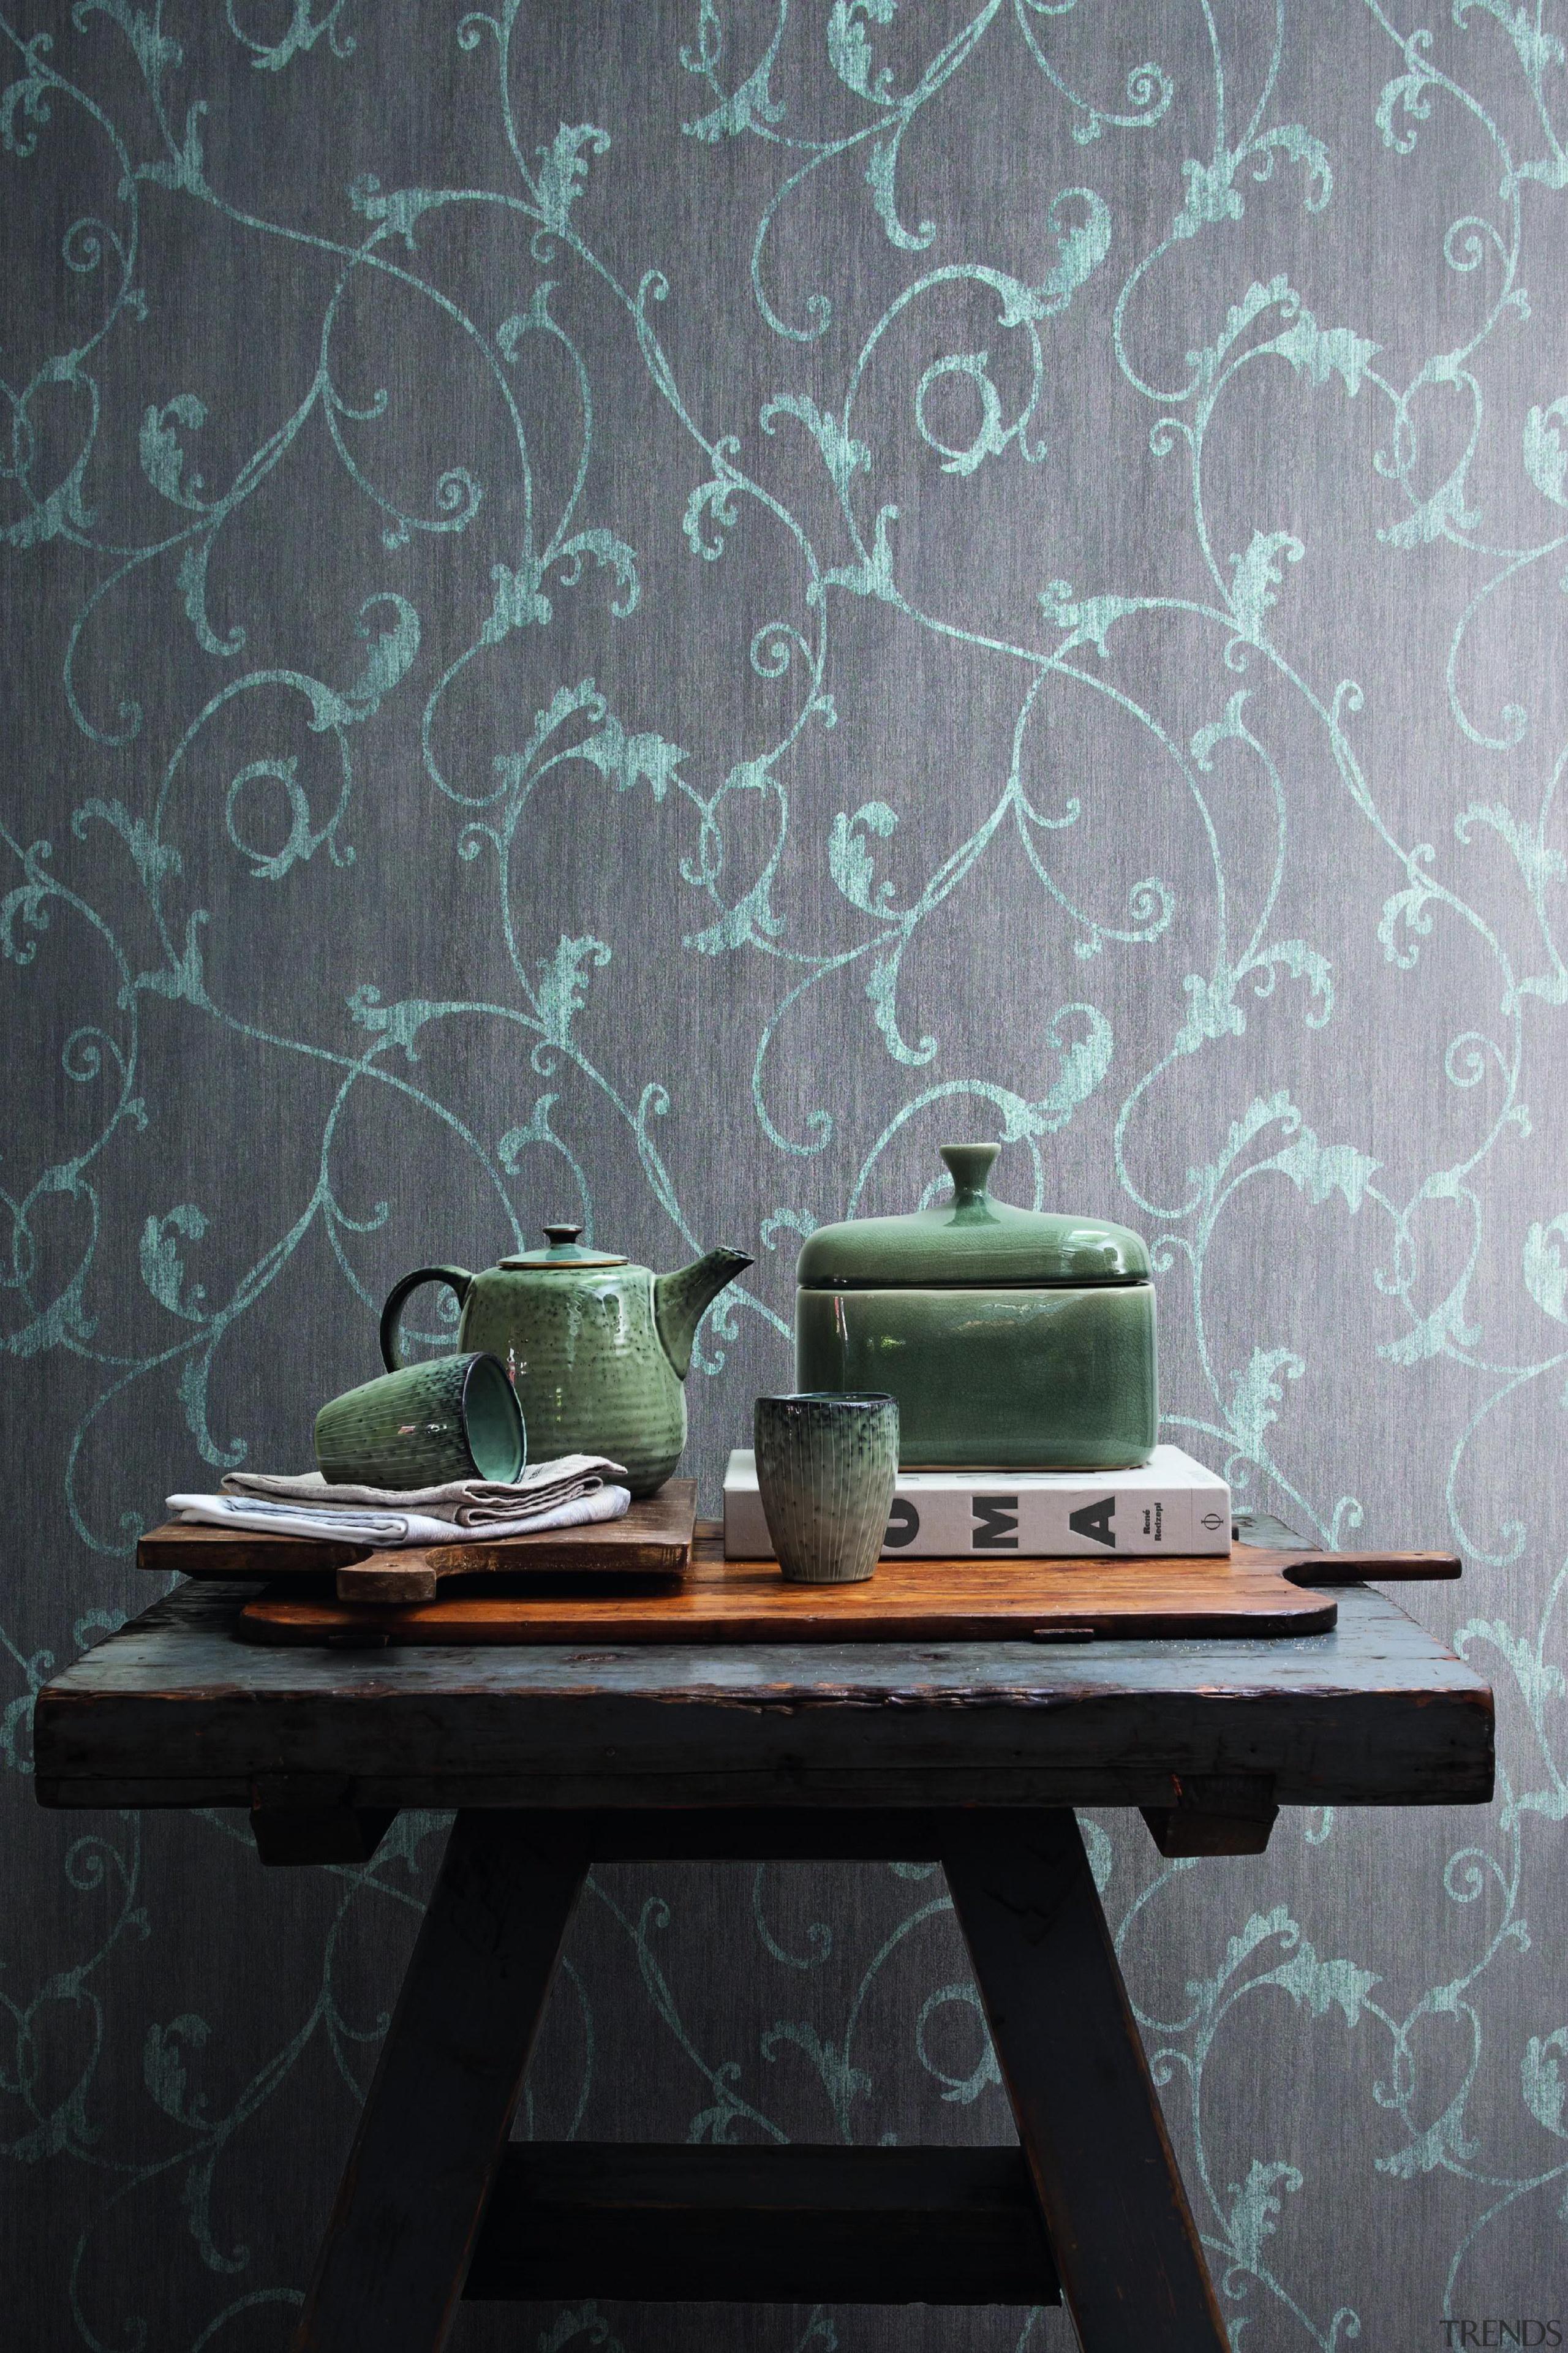 Camarque Range - Camarque Range - green   green, interior design, still life, still life photography, wall, wallpaper, gray, black